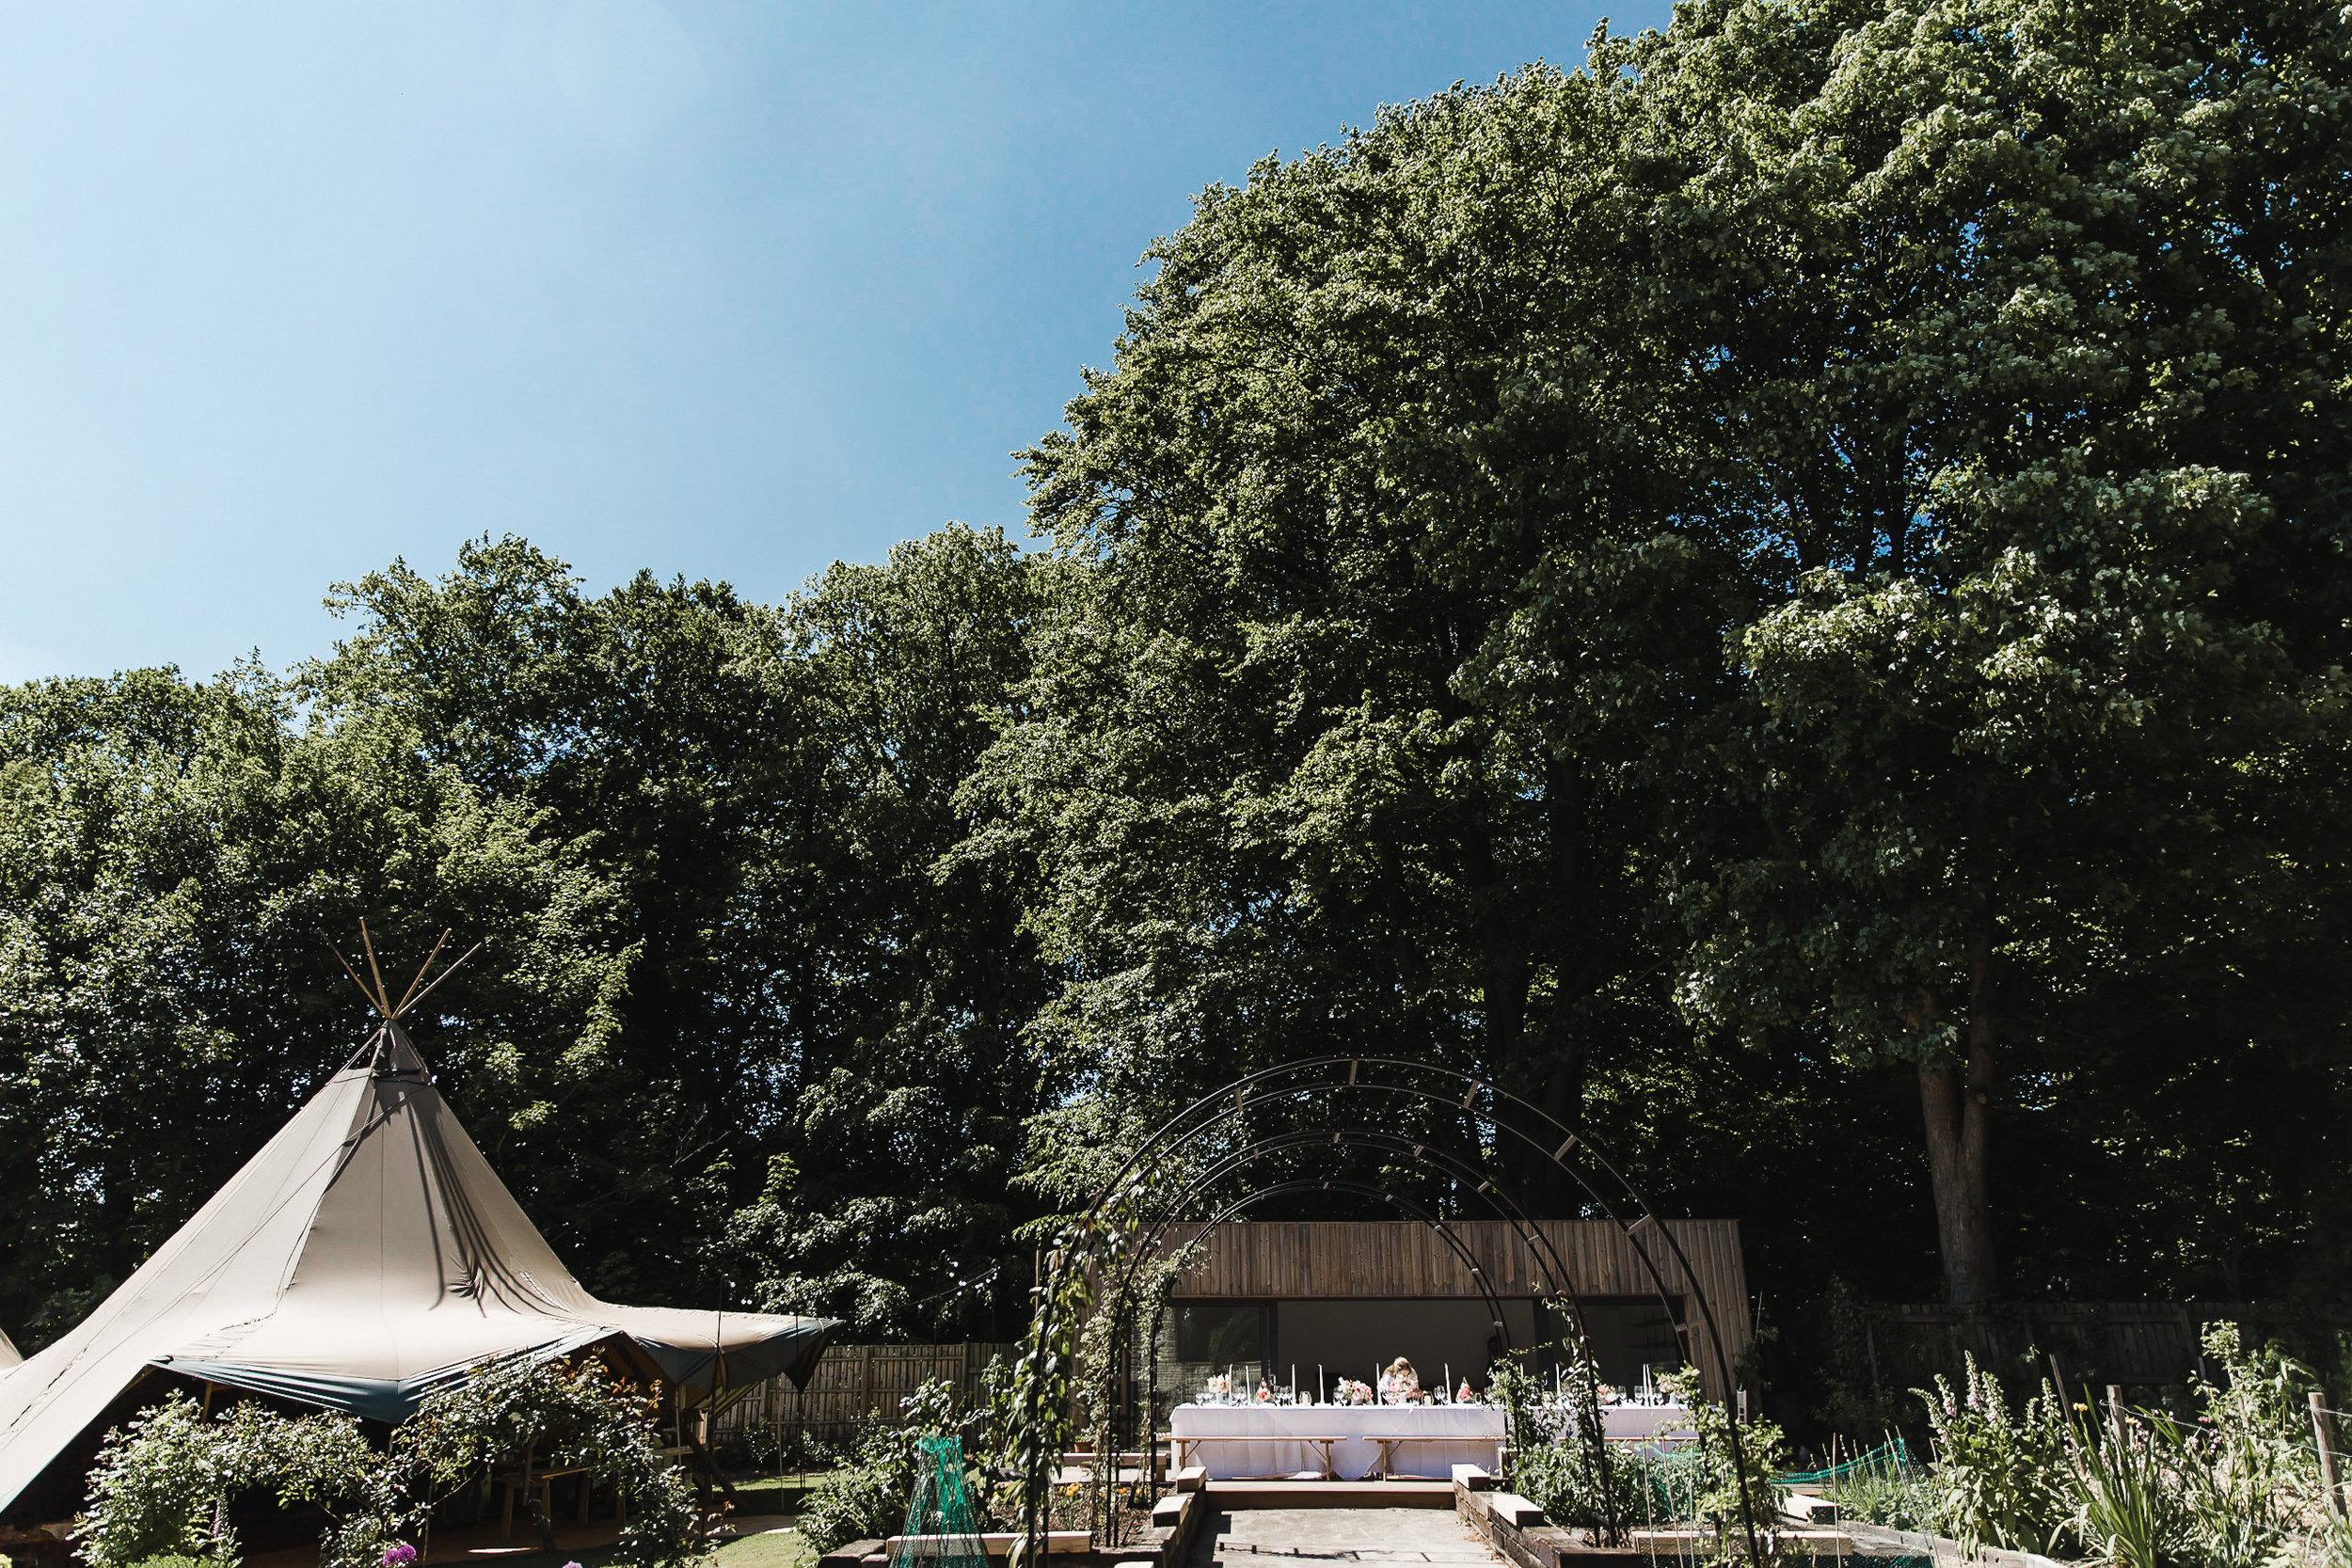 Roundhay-Leeds-Backyard-Wedding-Becs-Chris-126.jpg